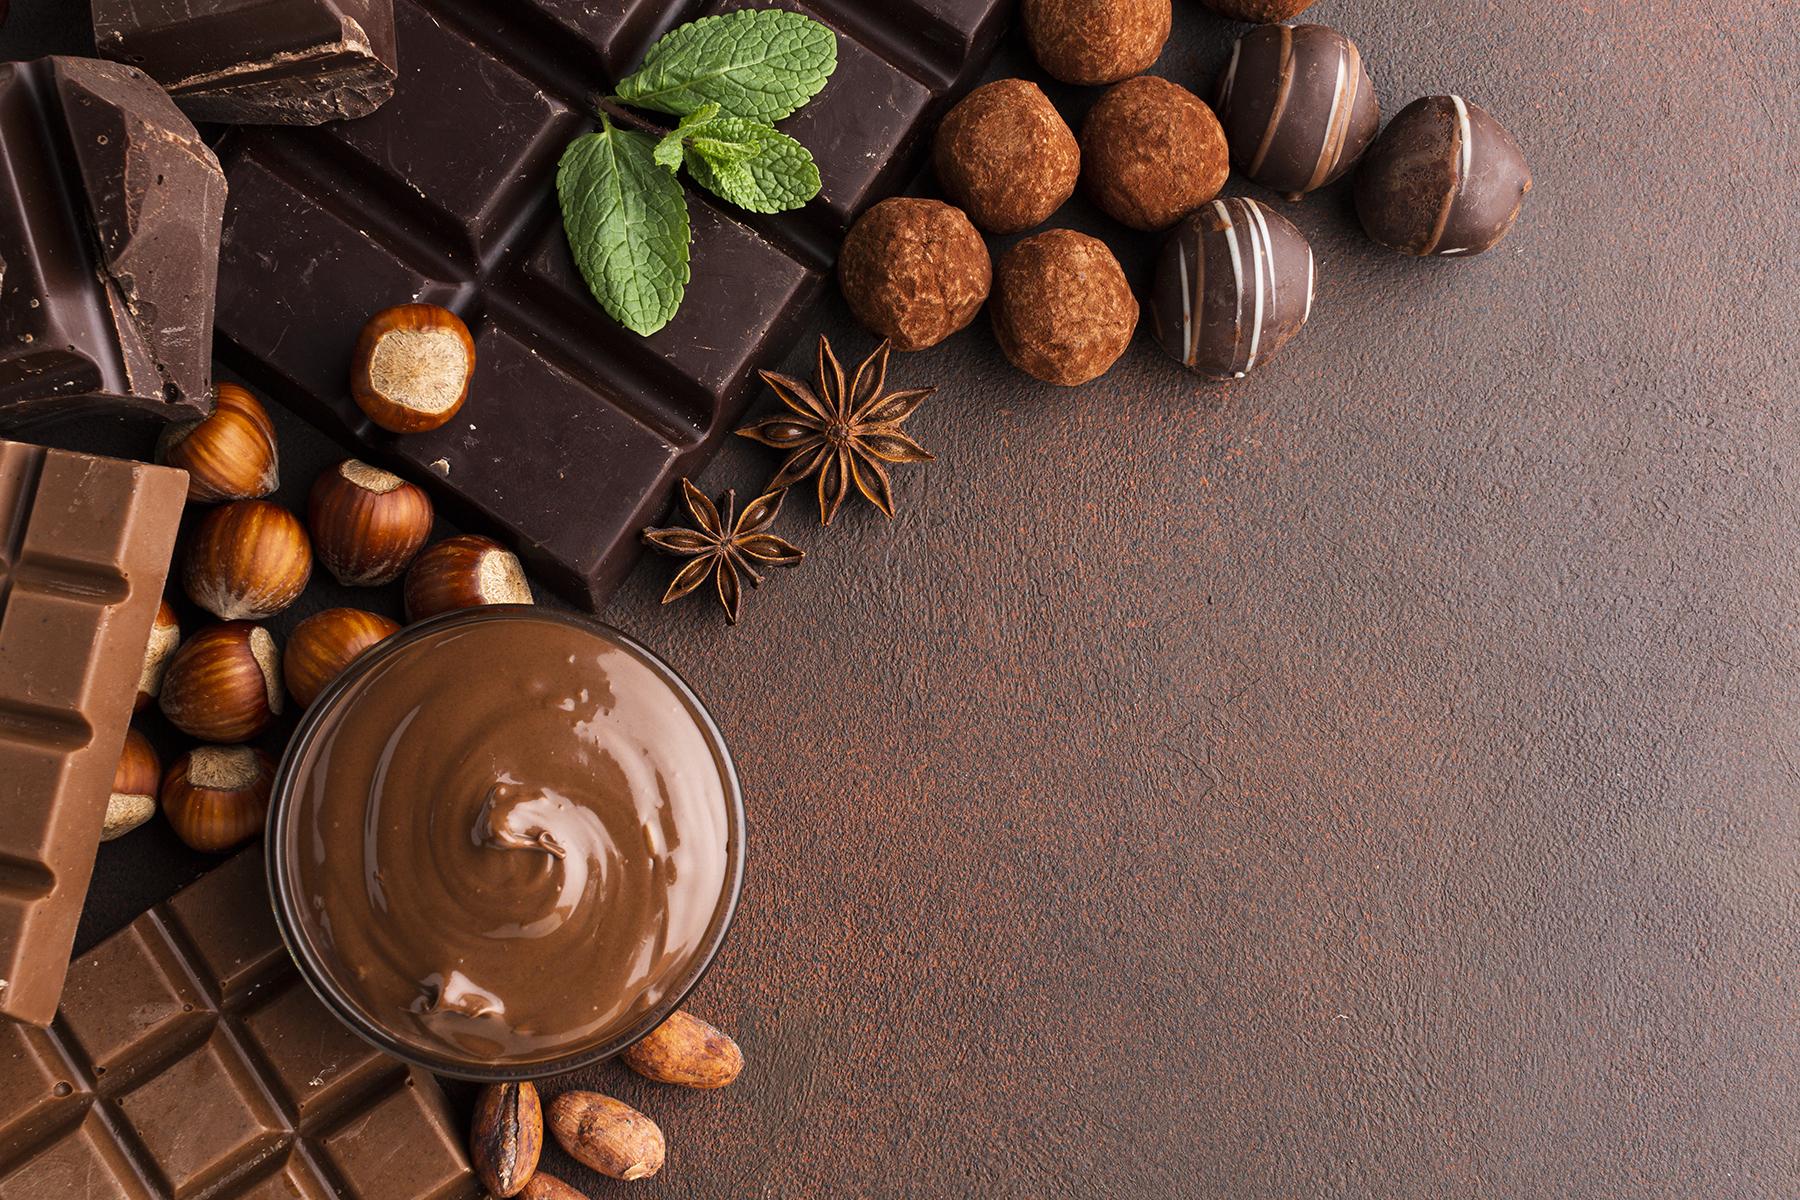 fond décor chocolat